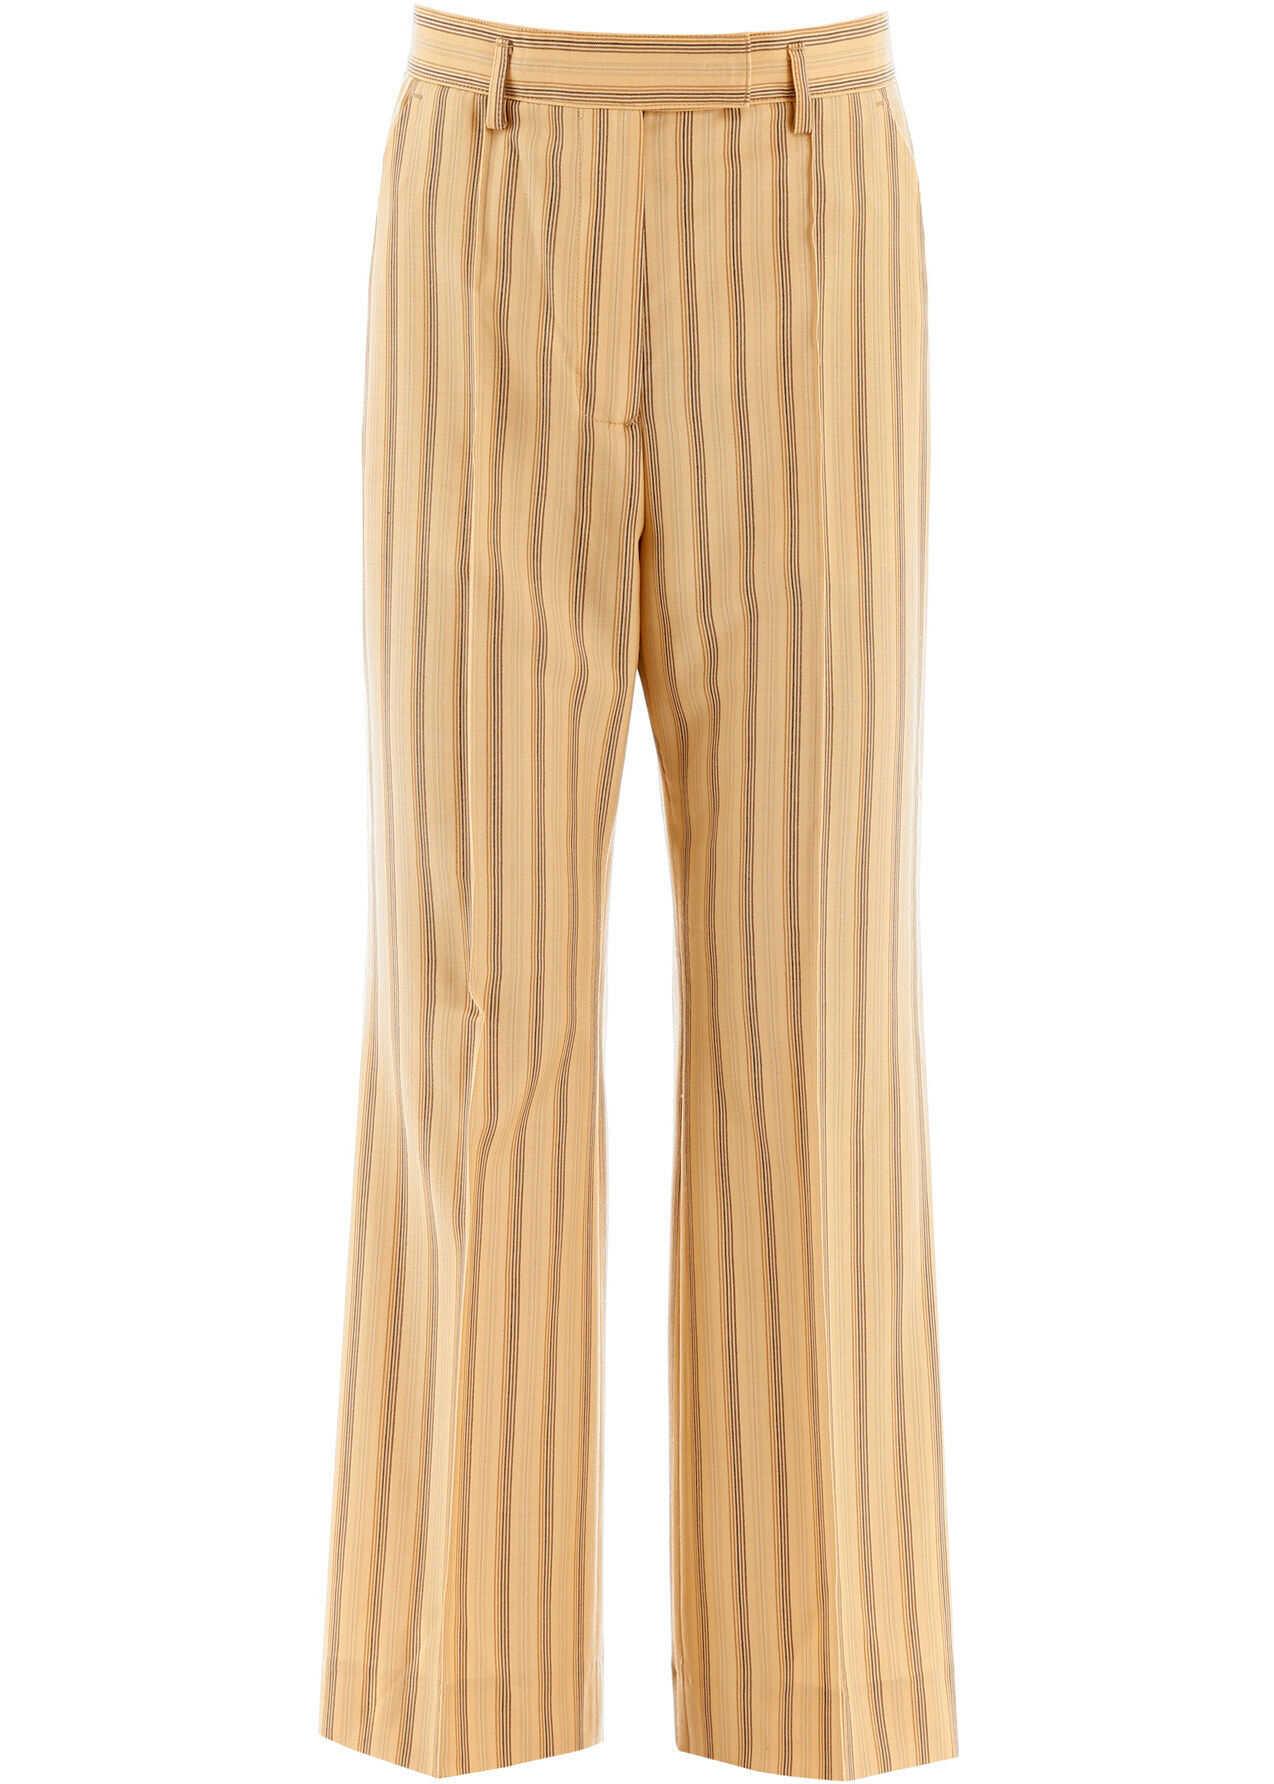 Acne Studios Striped Trousers PALE ORANGE